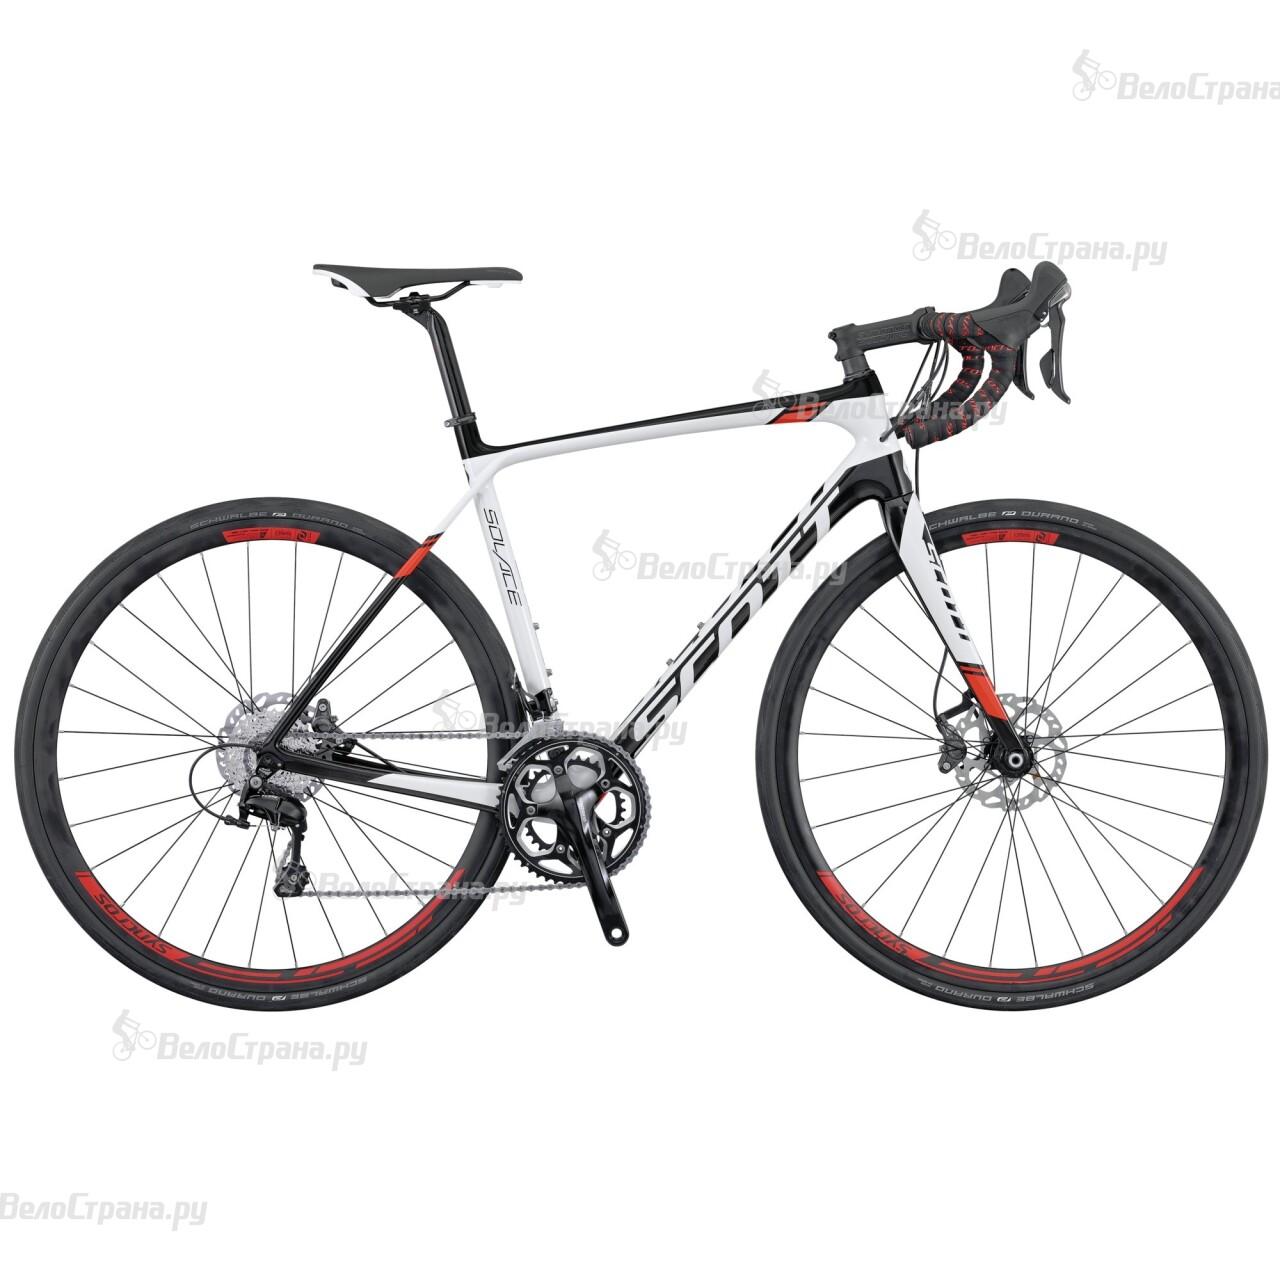 Велосипед Scott Solace 20 Disc (2016) велосипед scott contessa solace 15 disc 2017